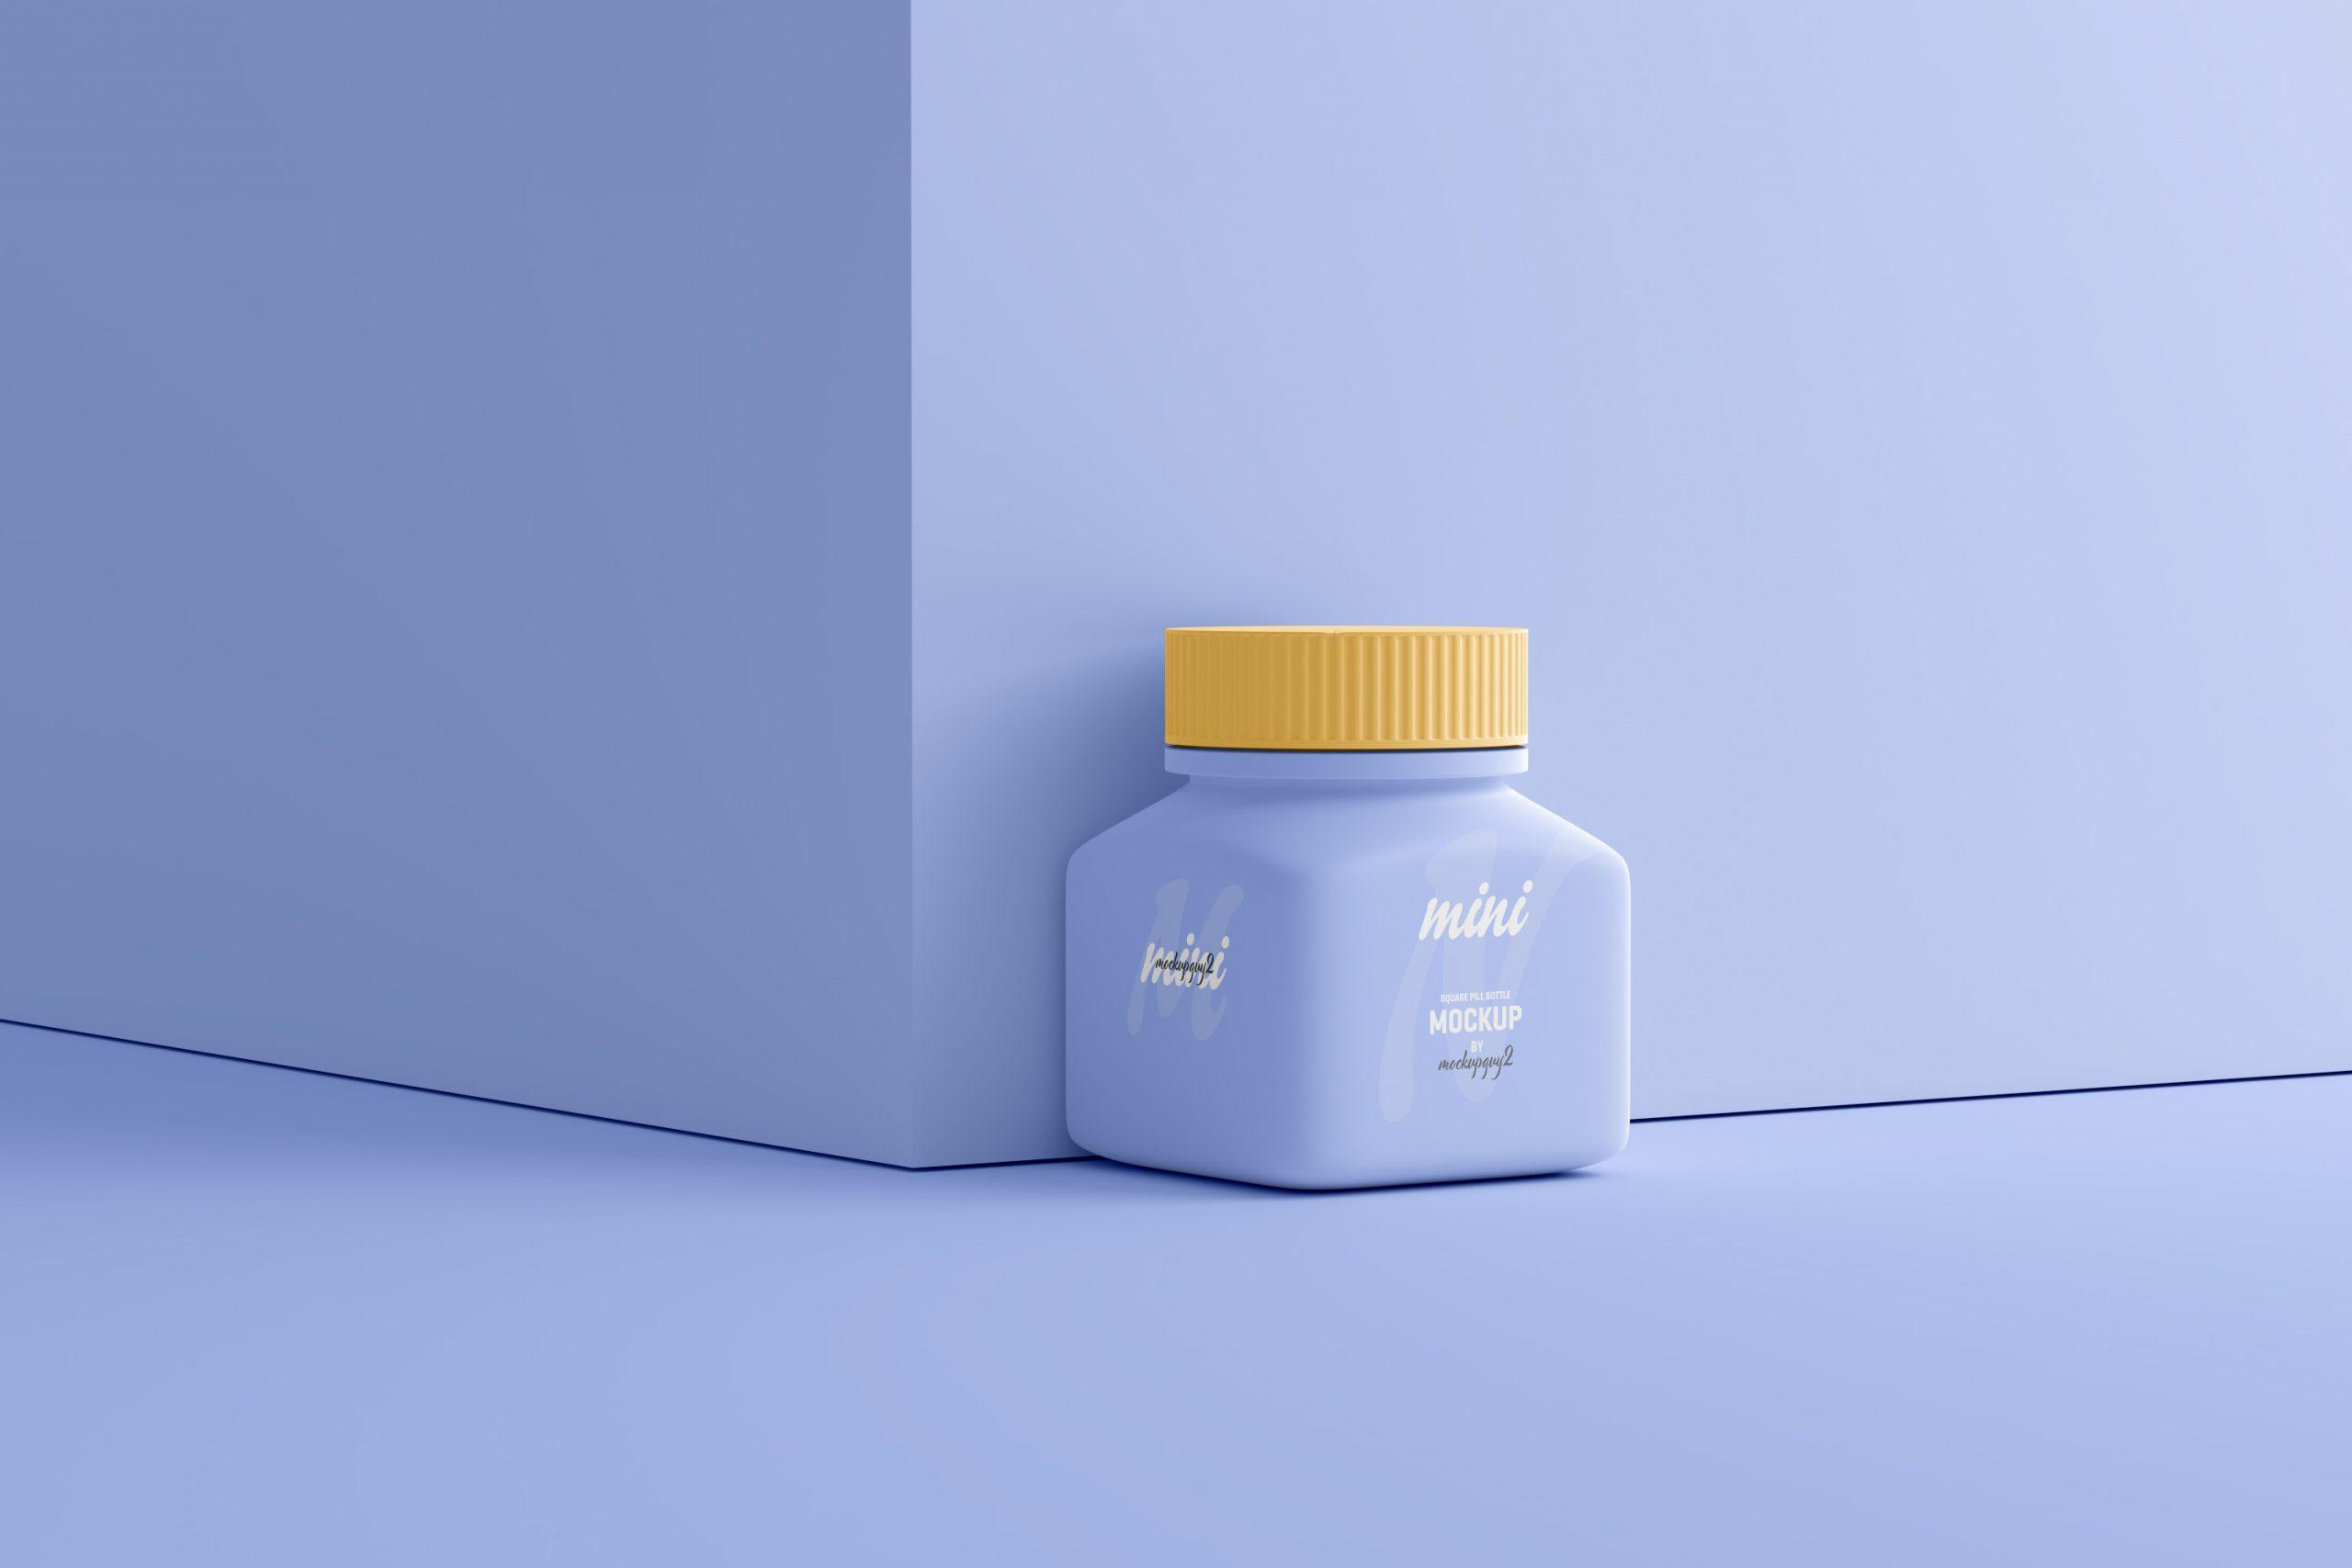 Small Square Pill Bottle Mockup